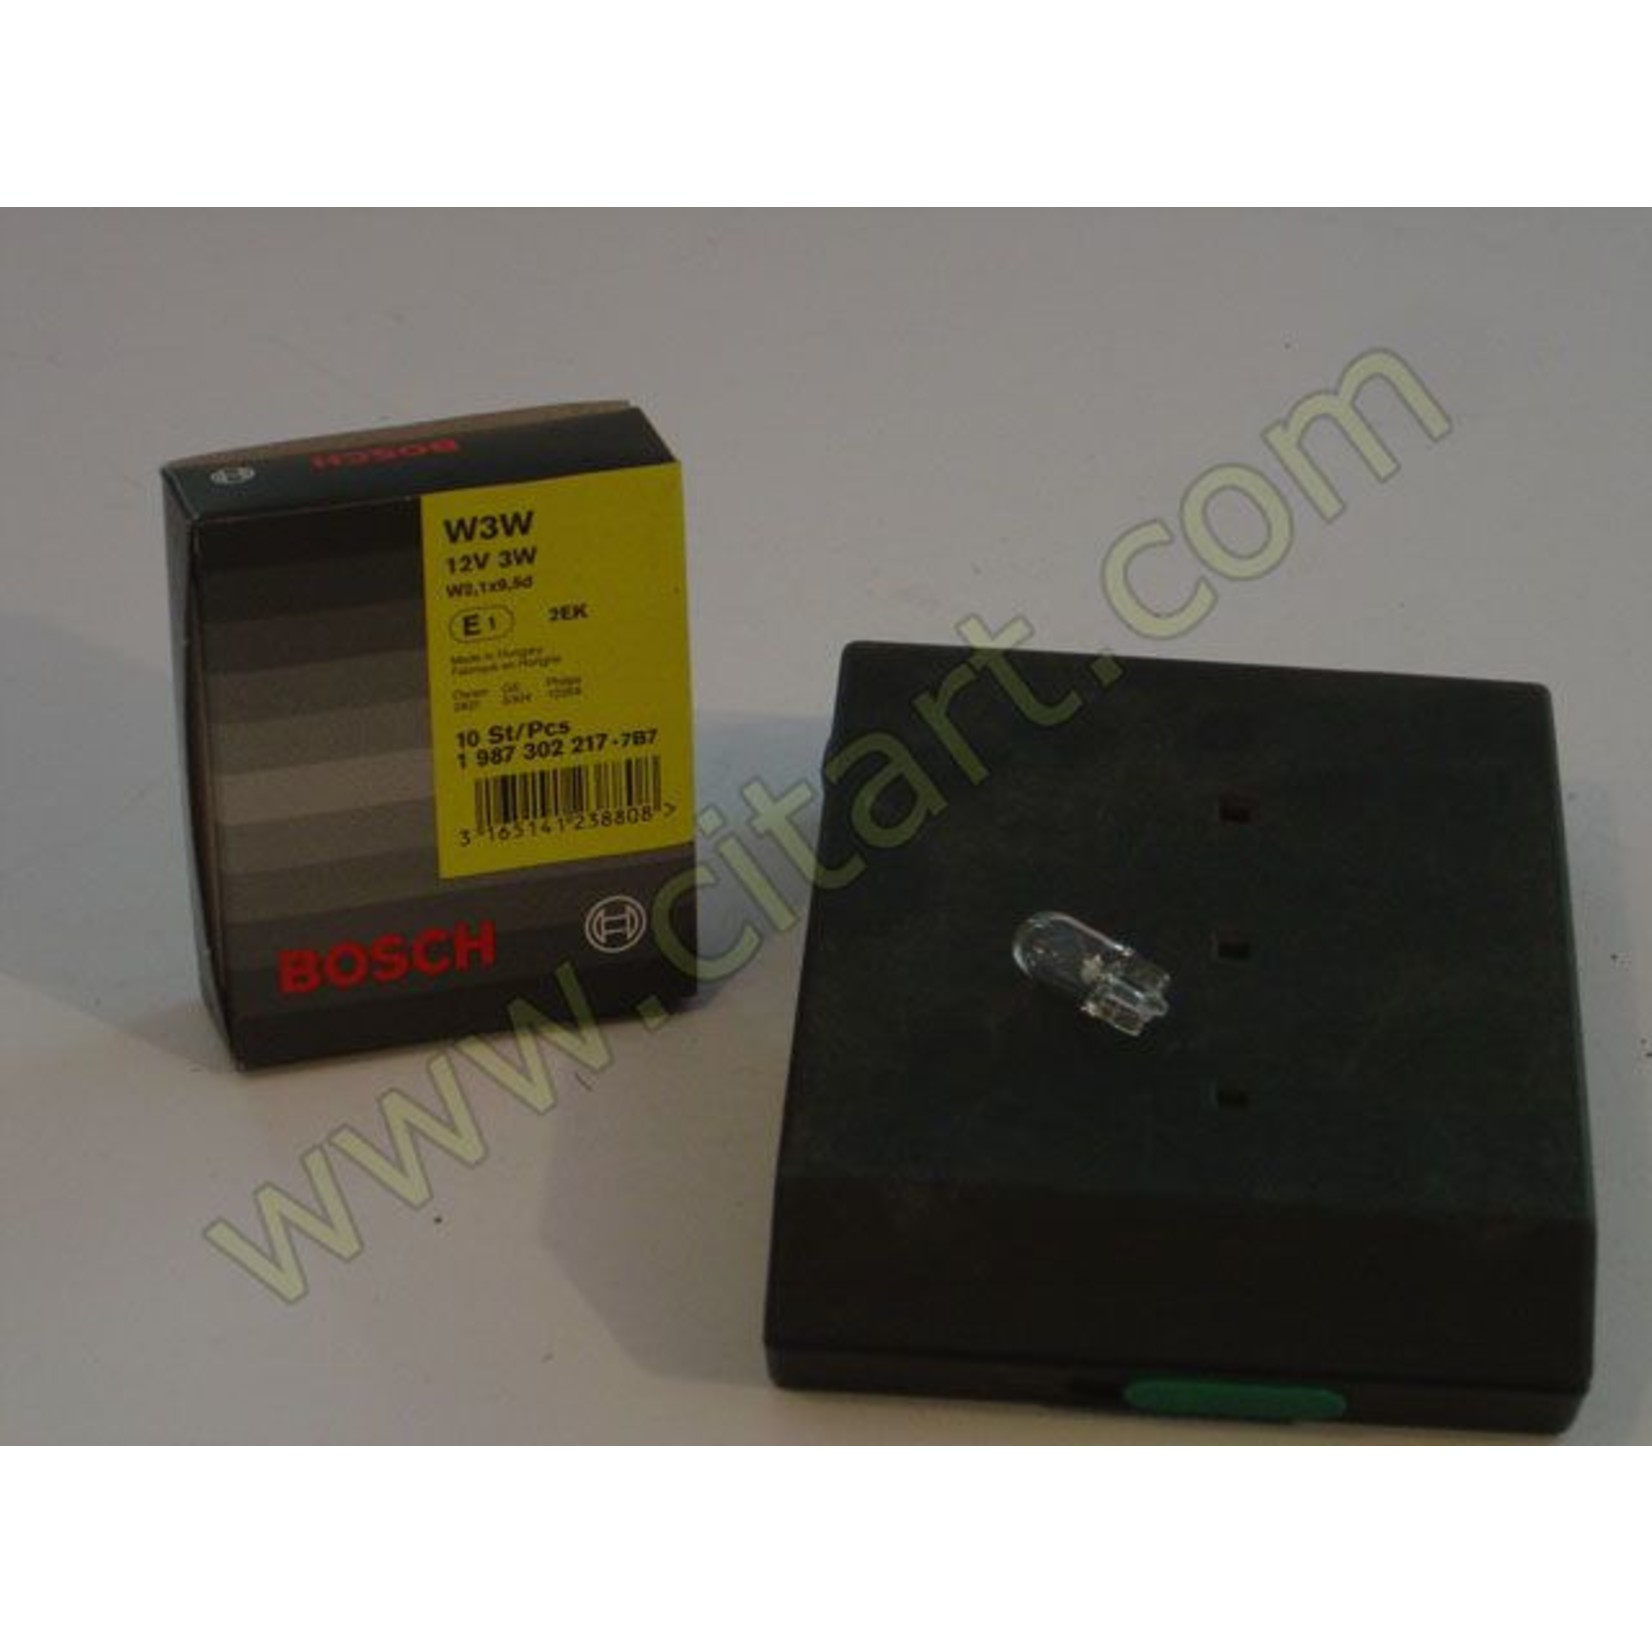 Dashbordlamp -07/72 12V - 3W Nr Org: ZC9614680